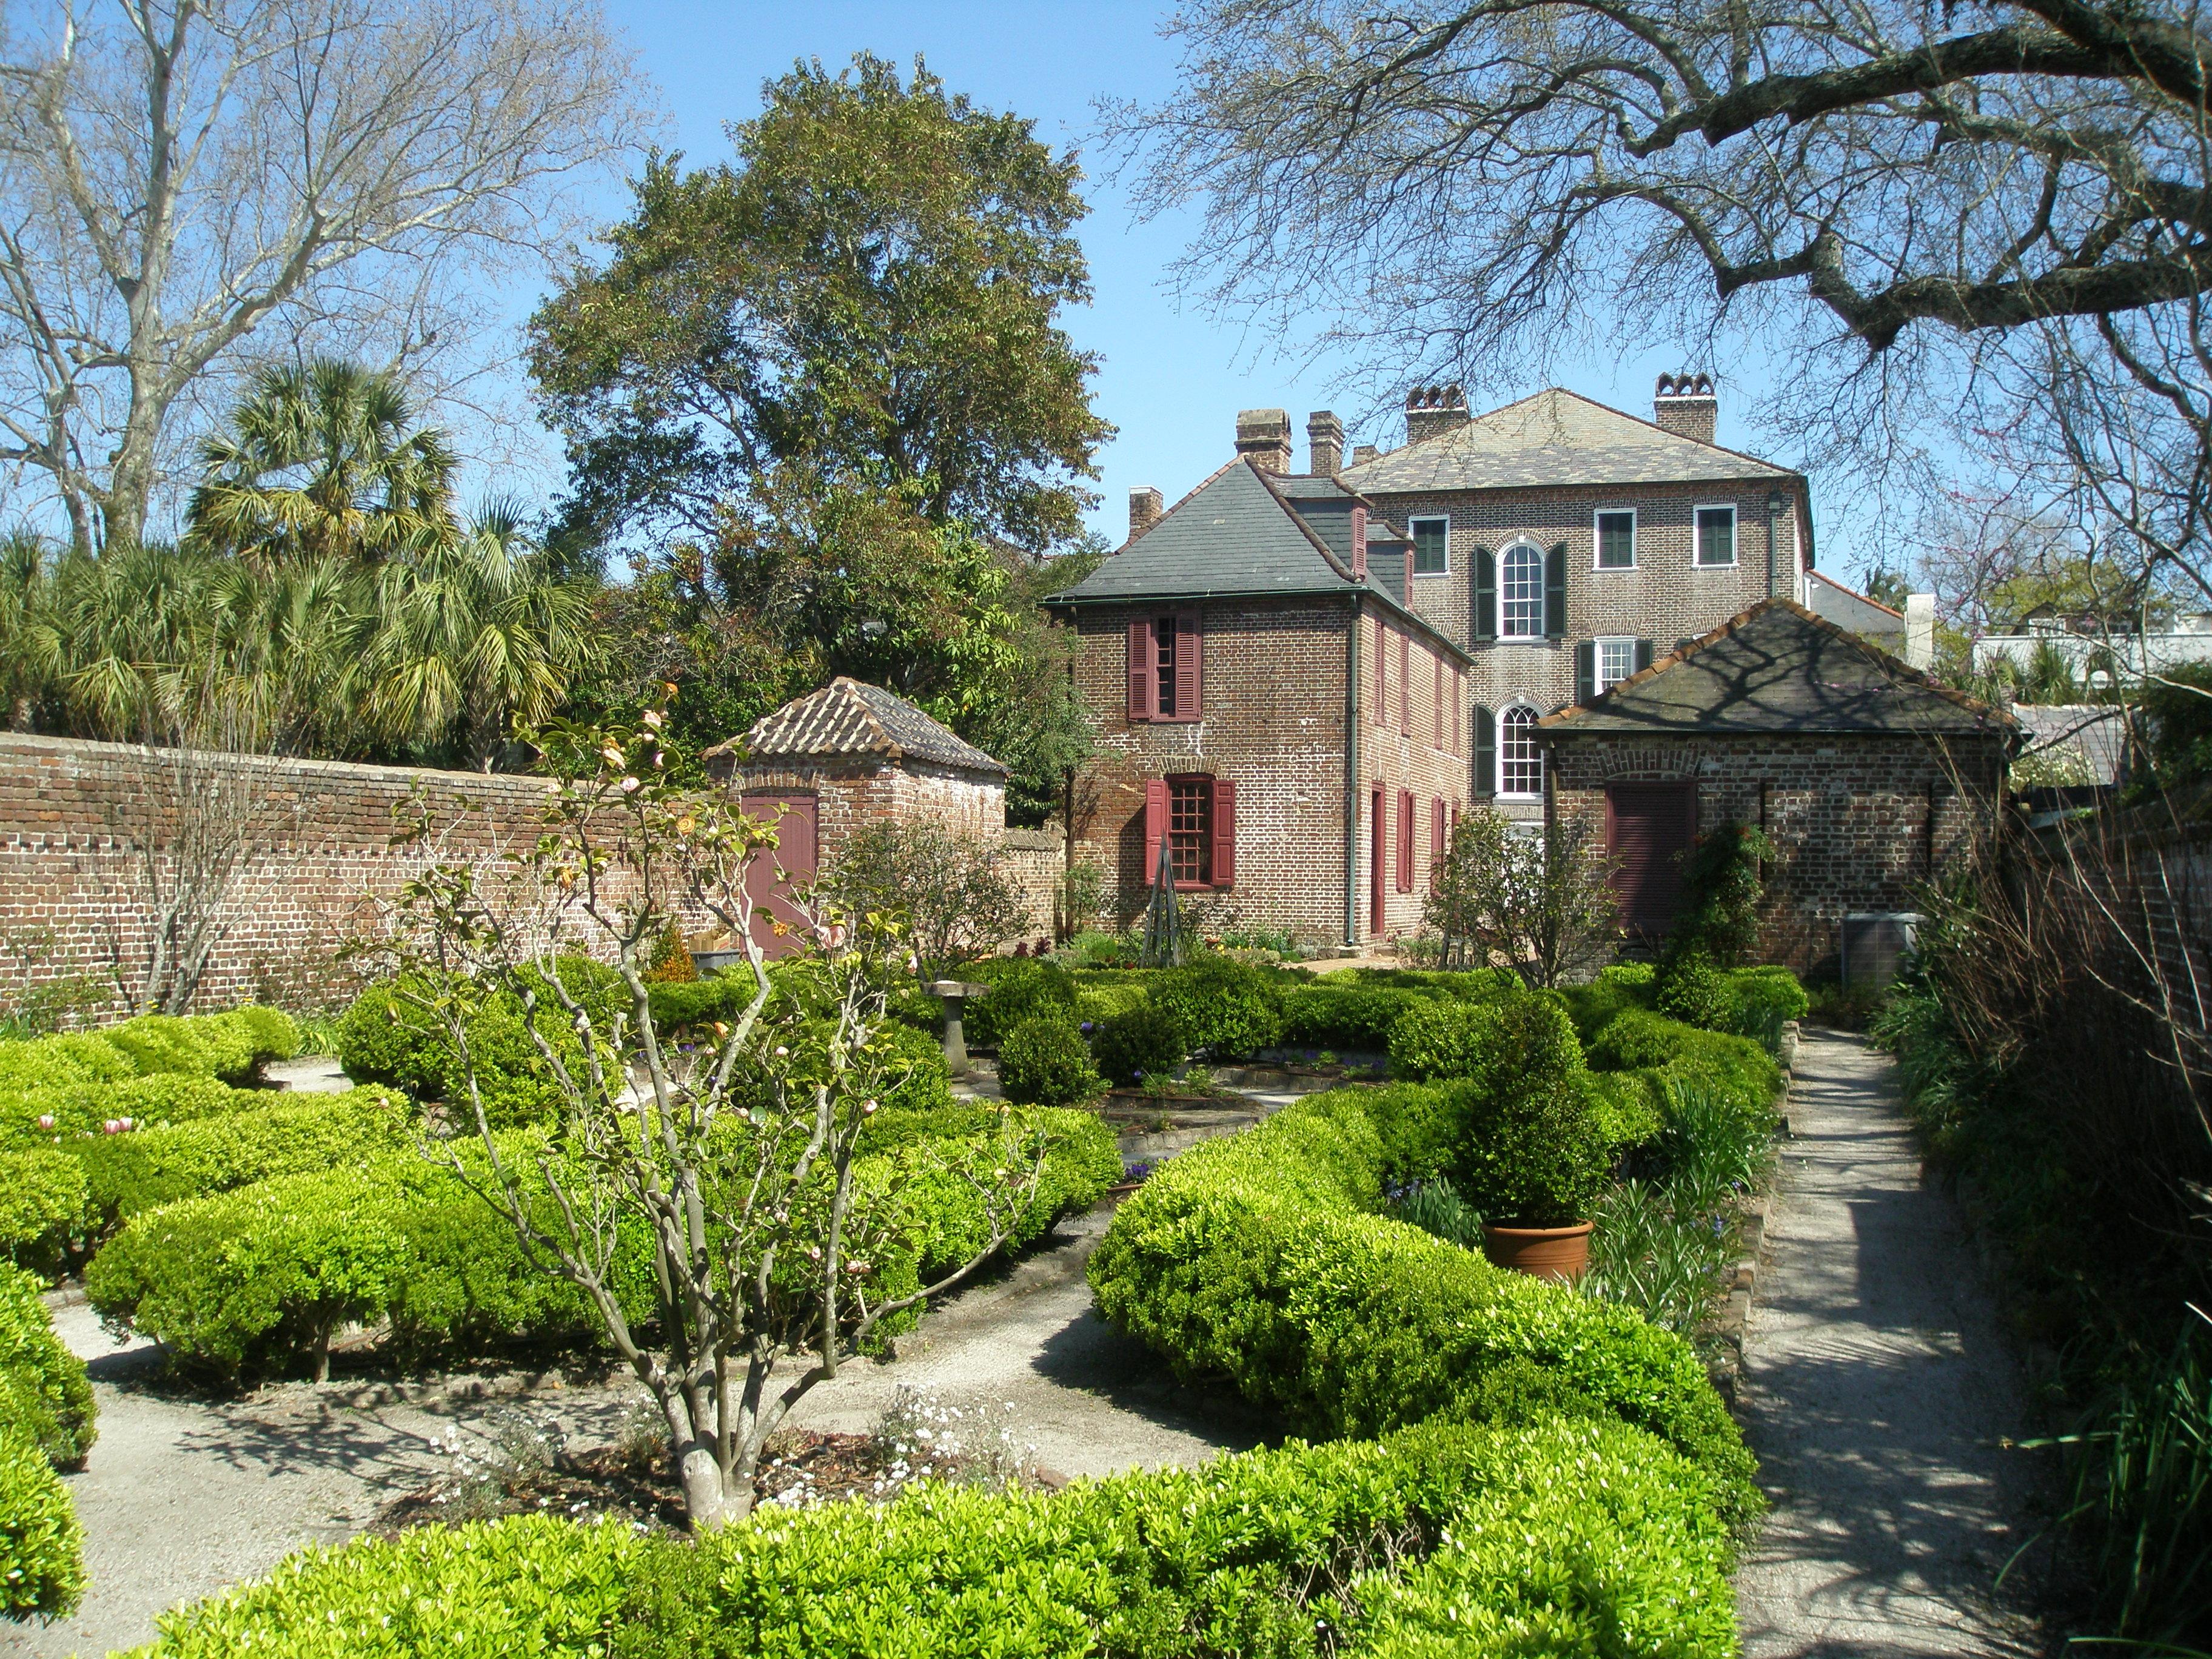 The Garden At The Heyward Washington House In Historic